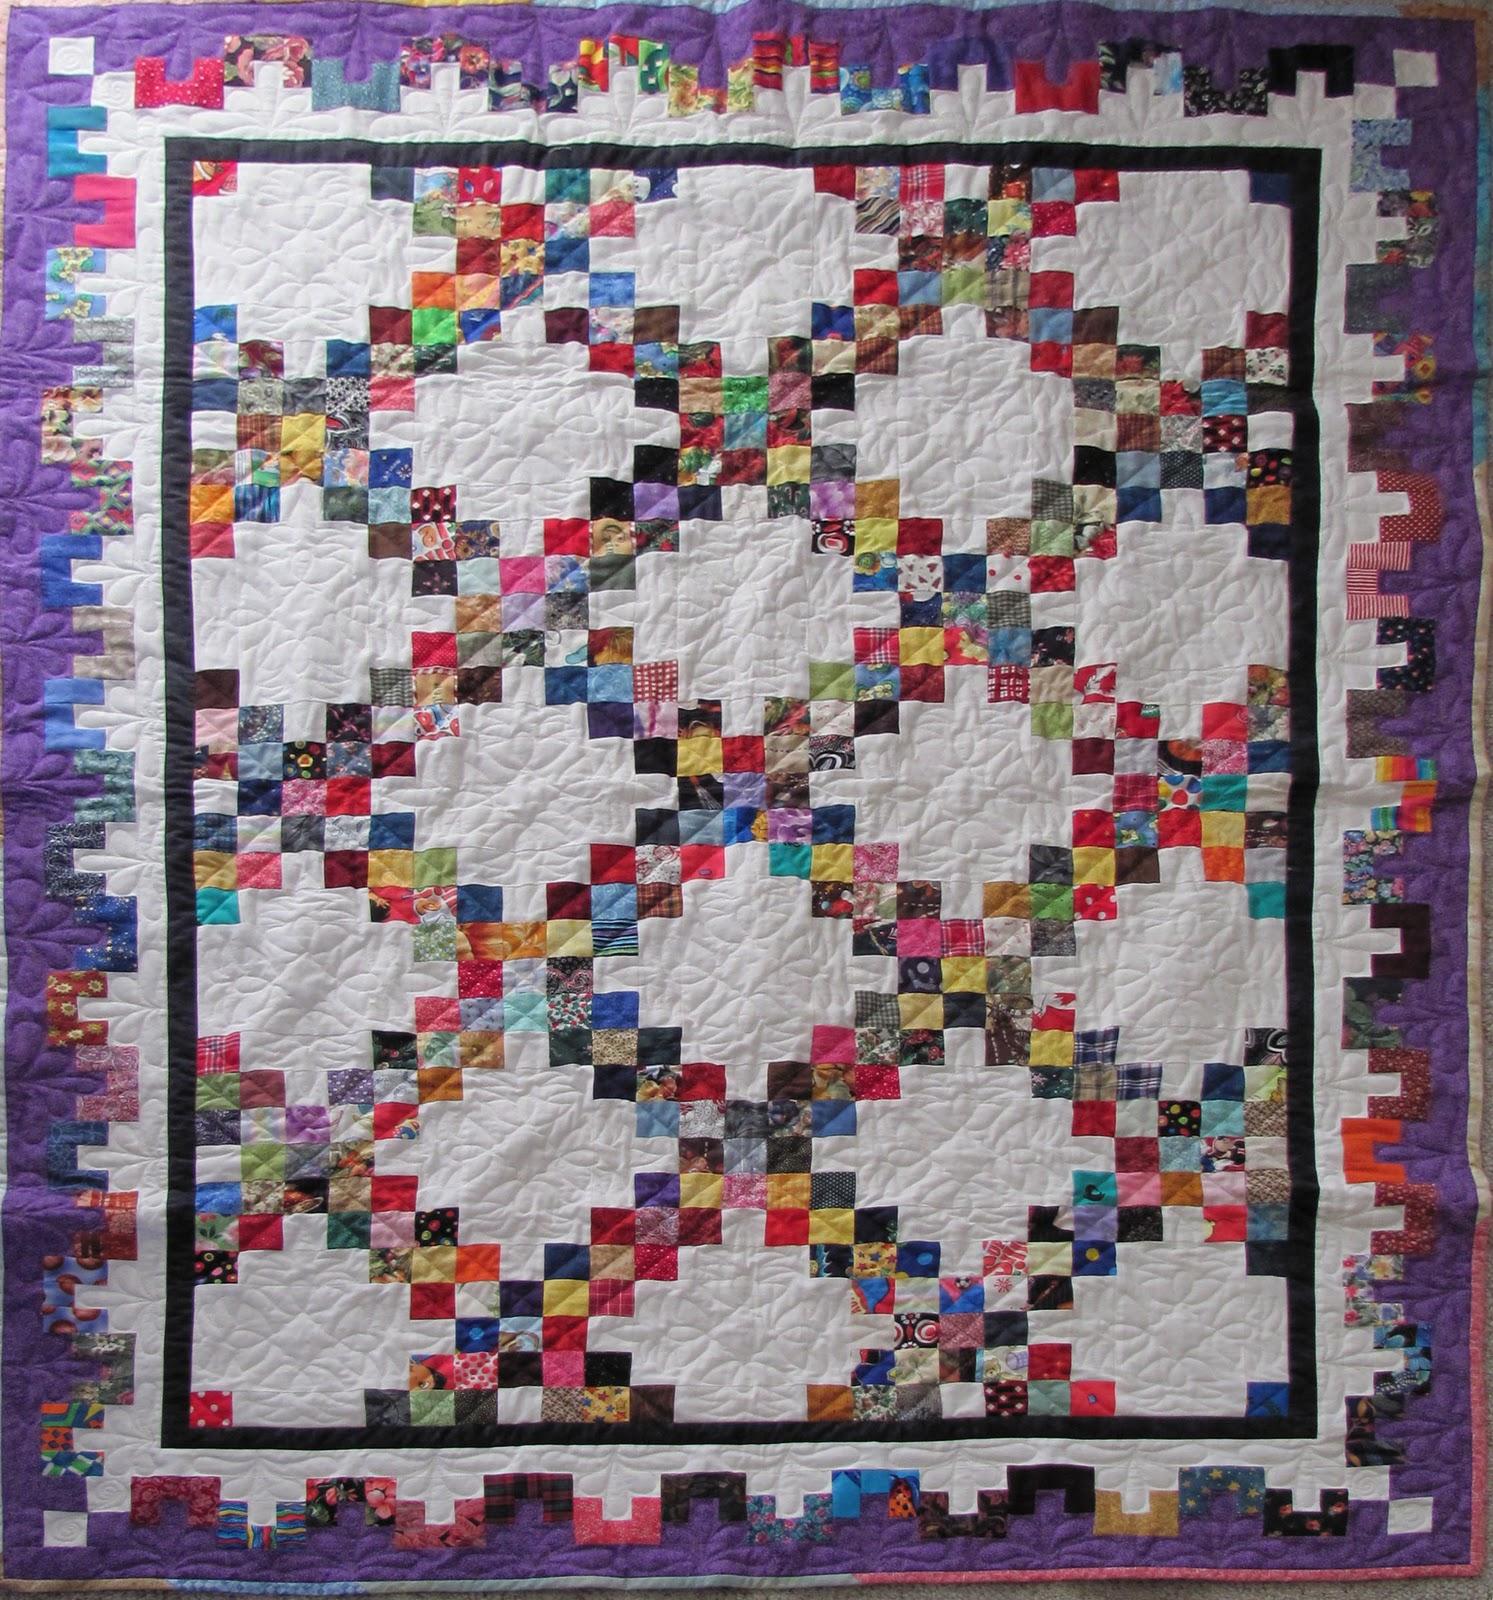 The Proficient Needle: Quilts 2010